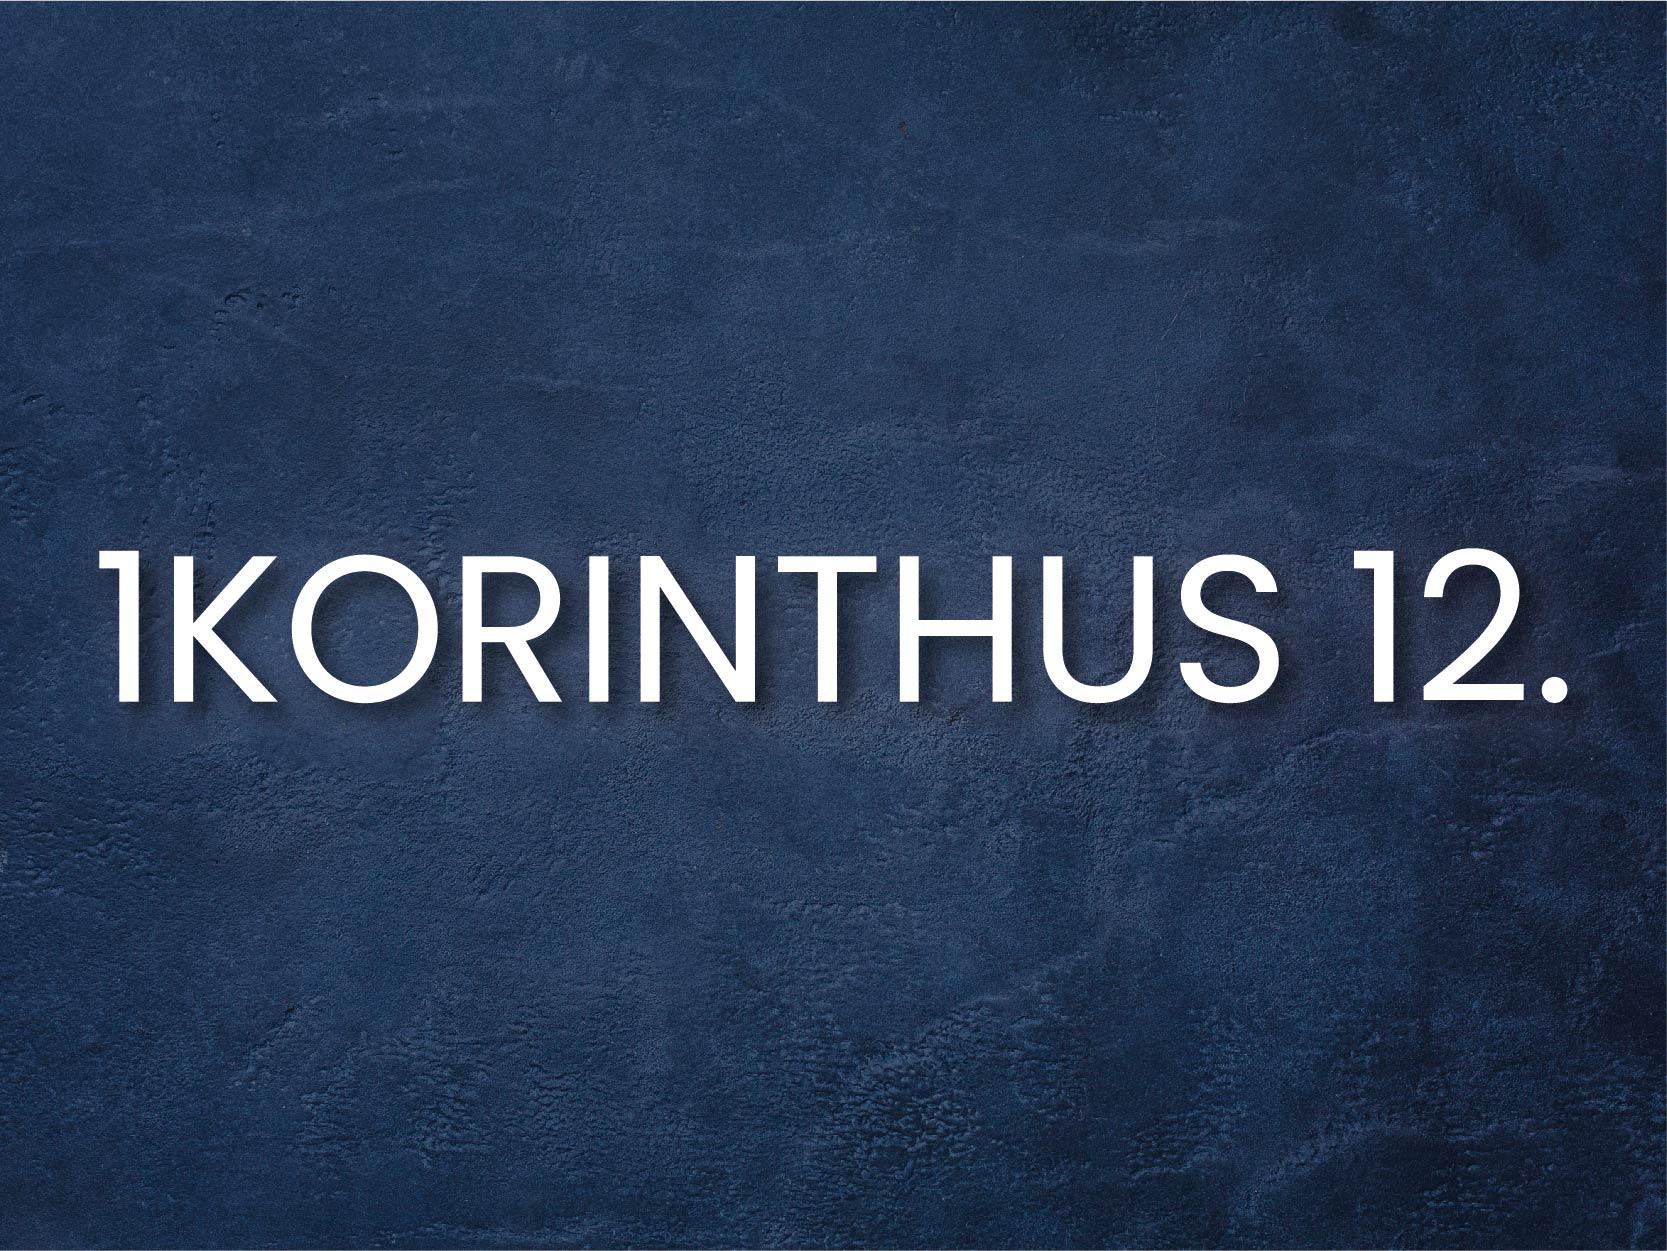 INFO_korinthus_12